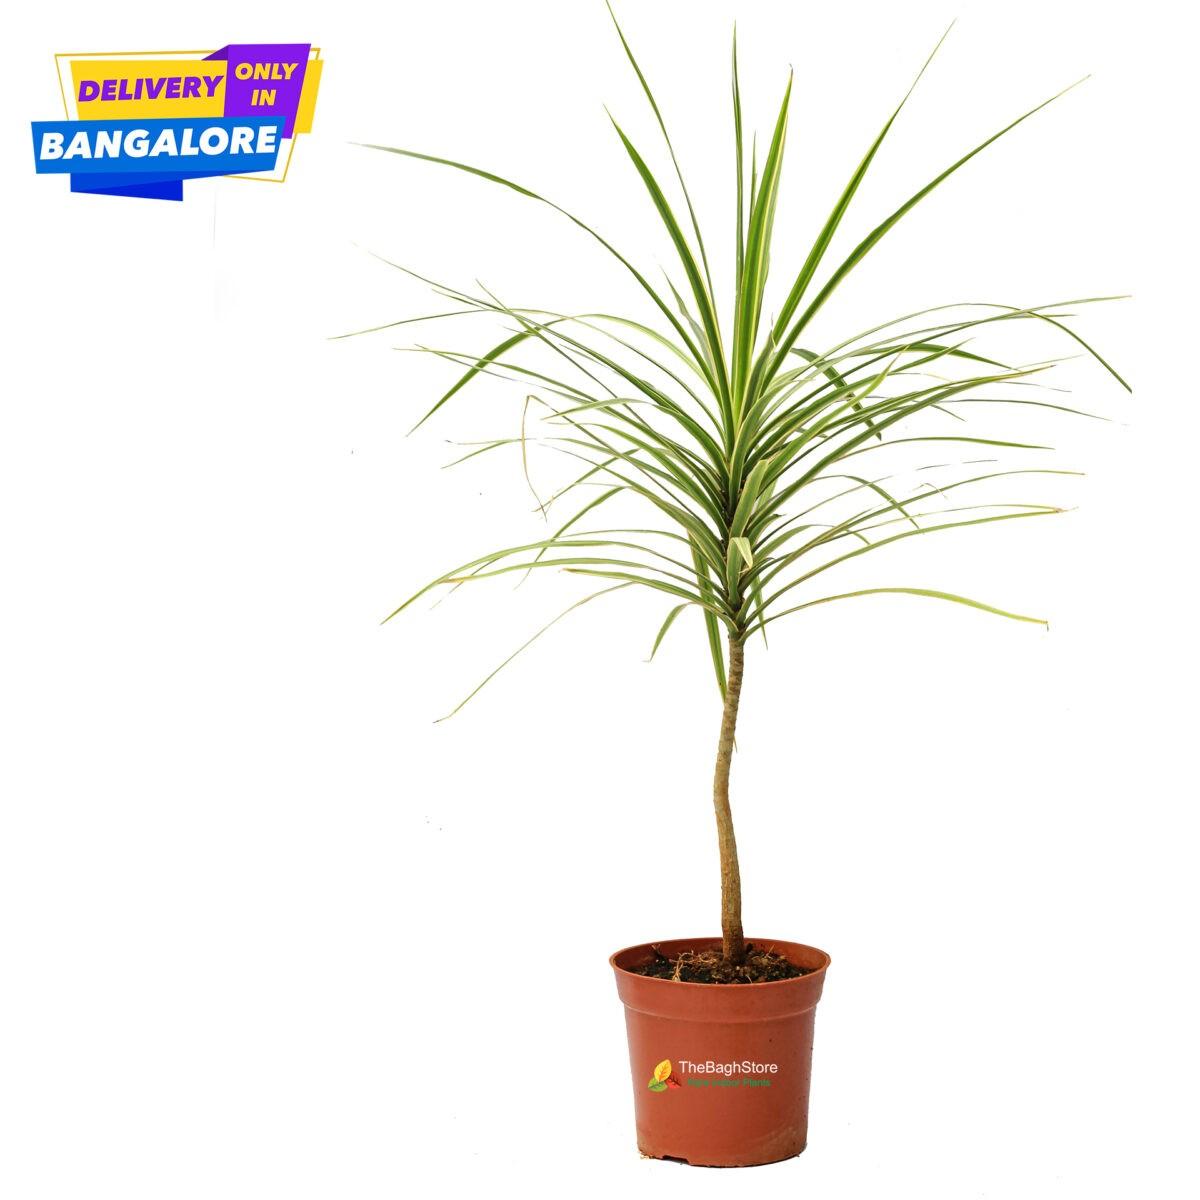 Dracaena marginata, , Dragon tree beautiful decorative plant online bangalore nursery near